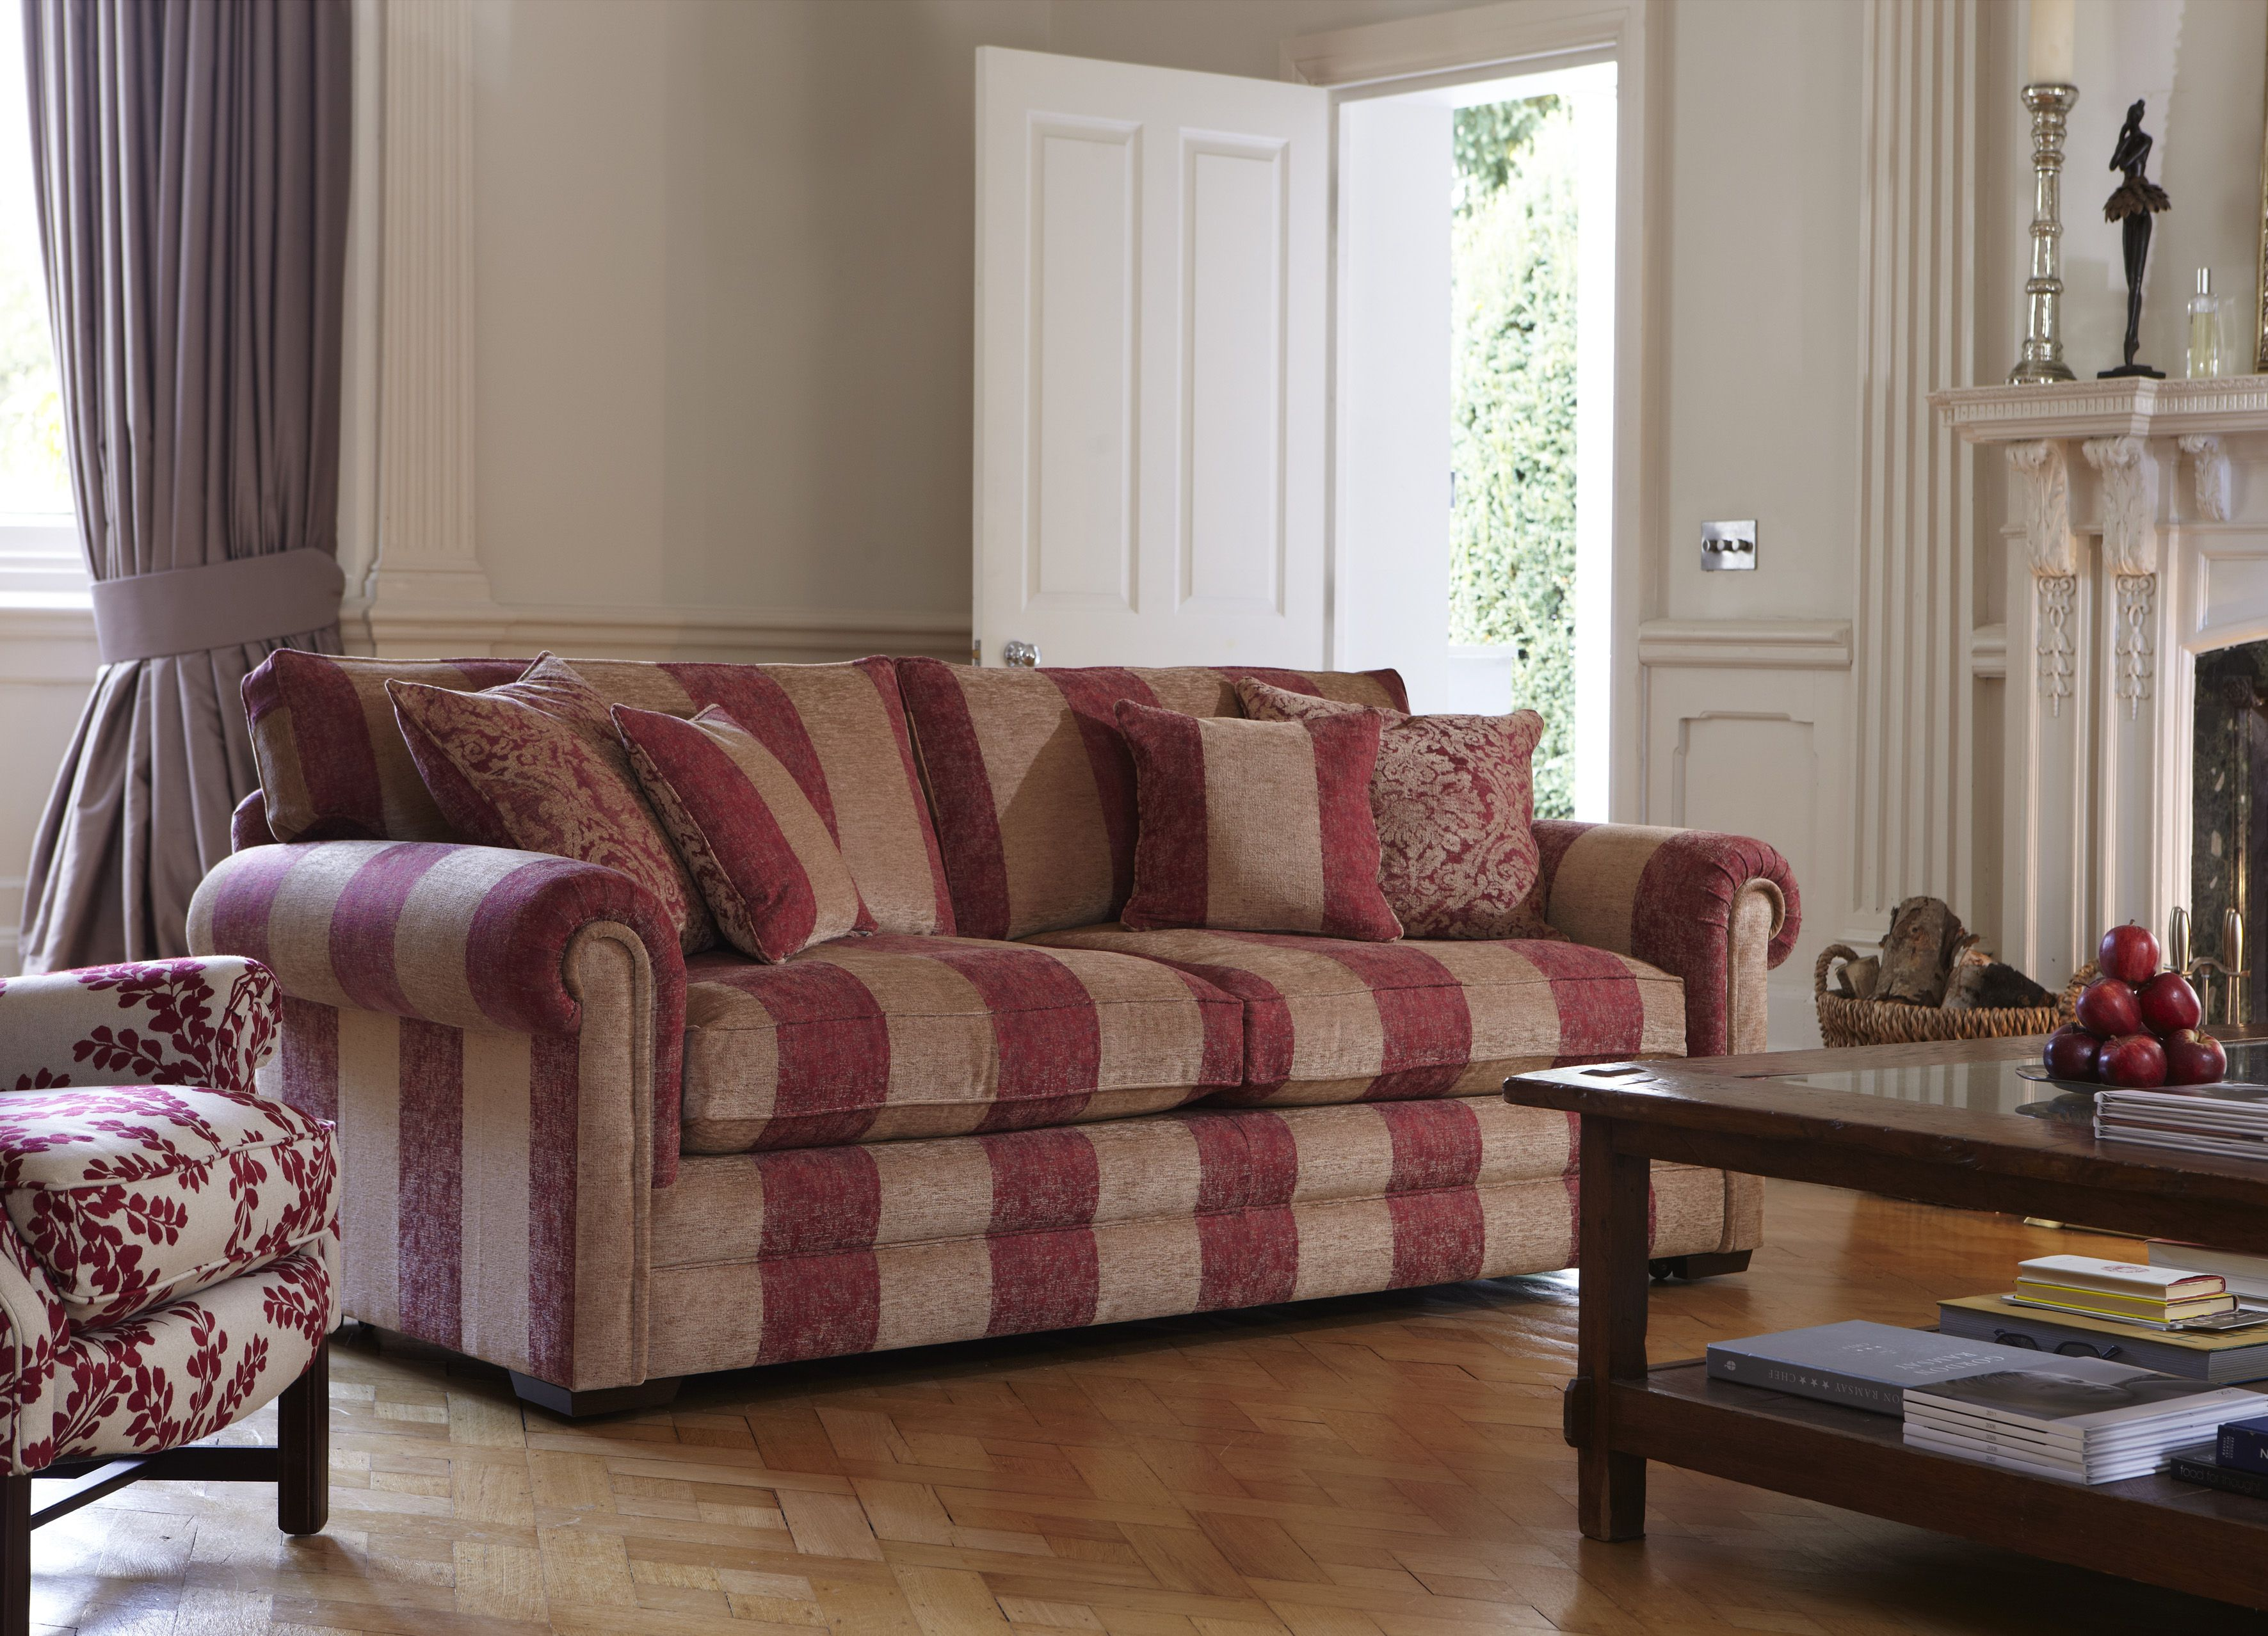 parker knoll canterbury sofa bed e poltrona sala pequena in florentine stripe the classic